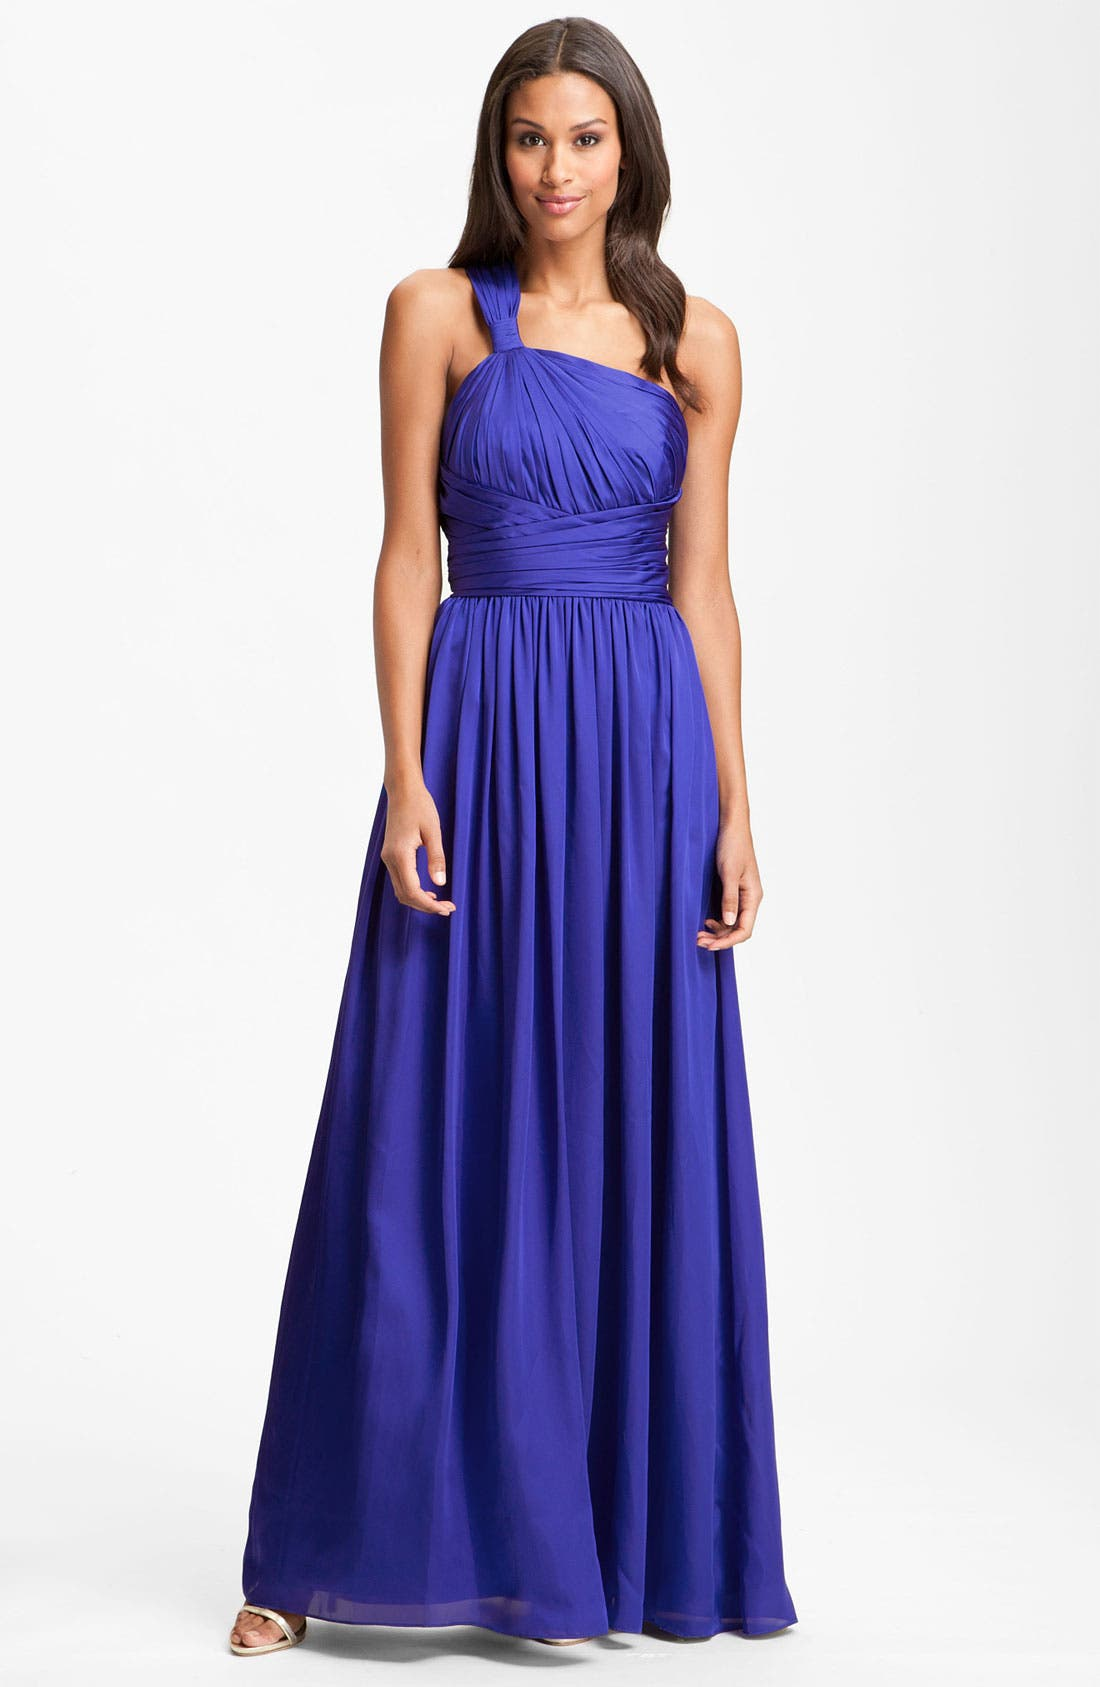 Main Image - ML Monique Lhuillier Bridesmaids One Shoulder Charmeuse Gown (Nordstrom Exclusive)